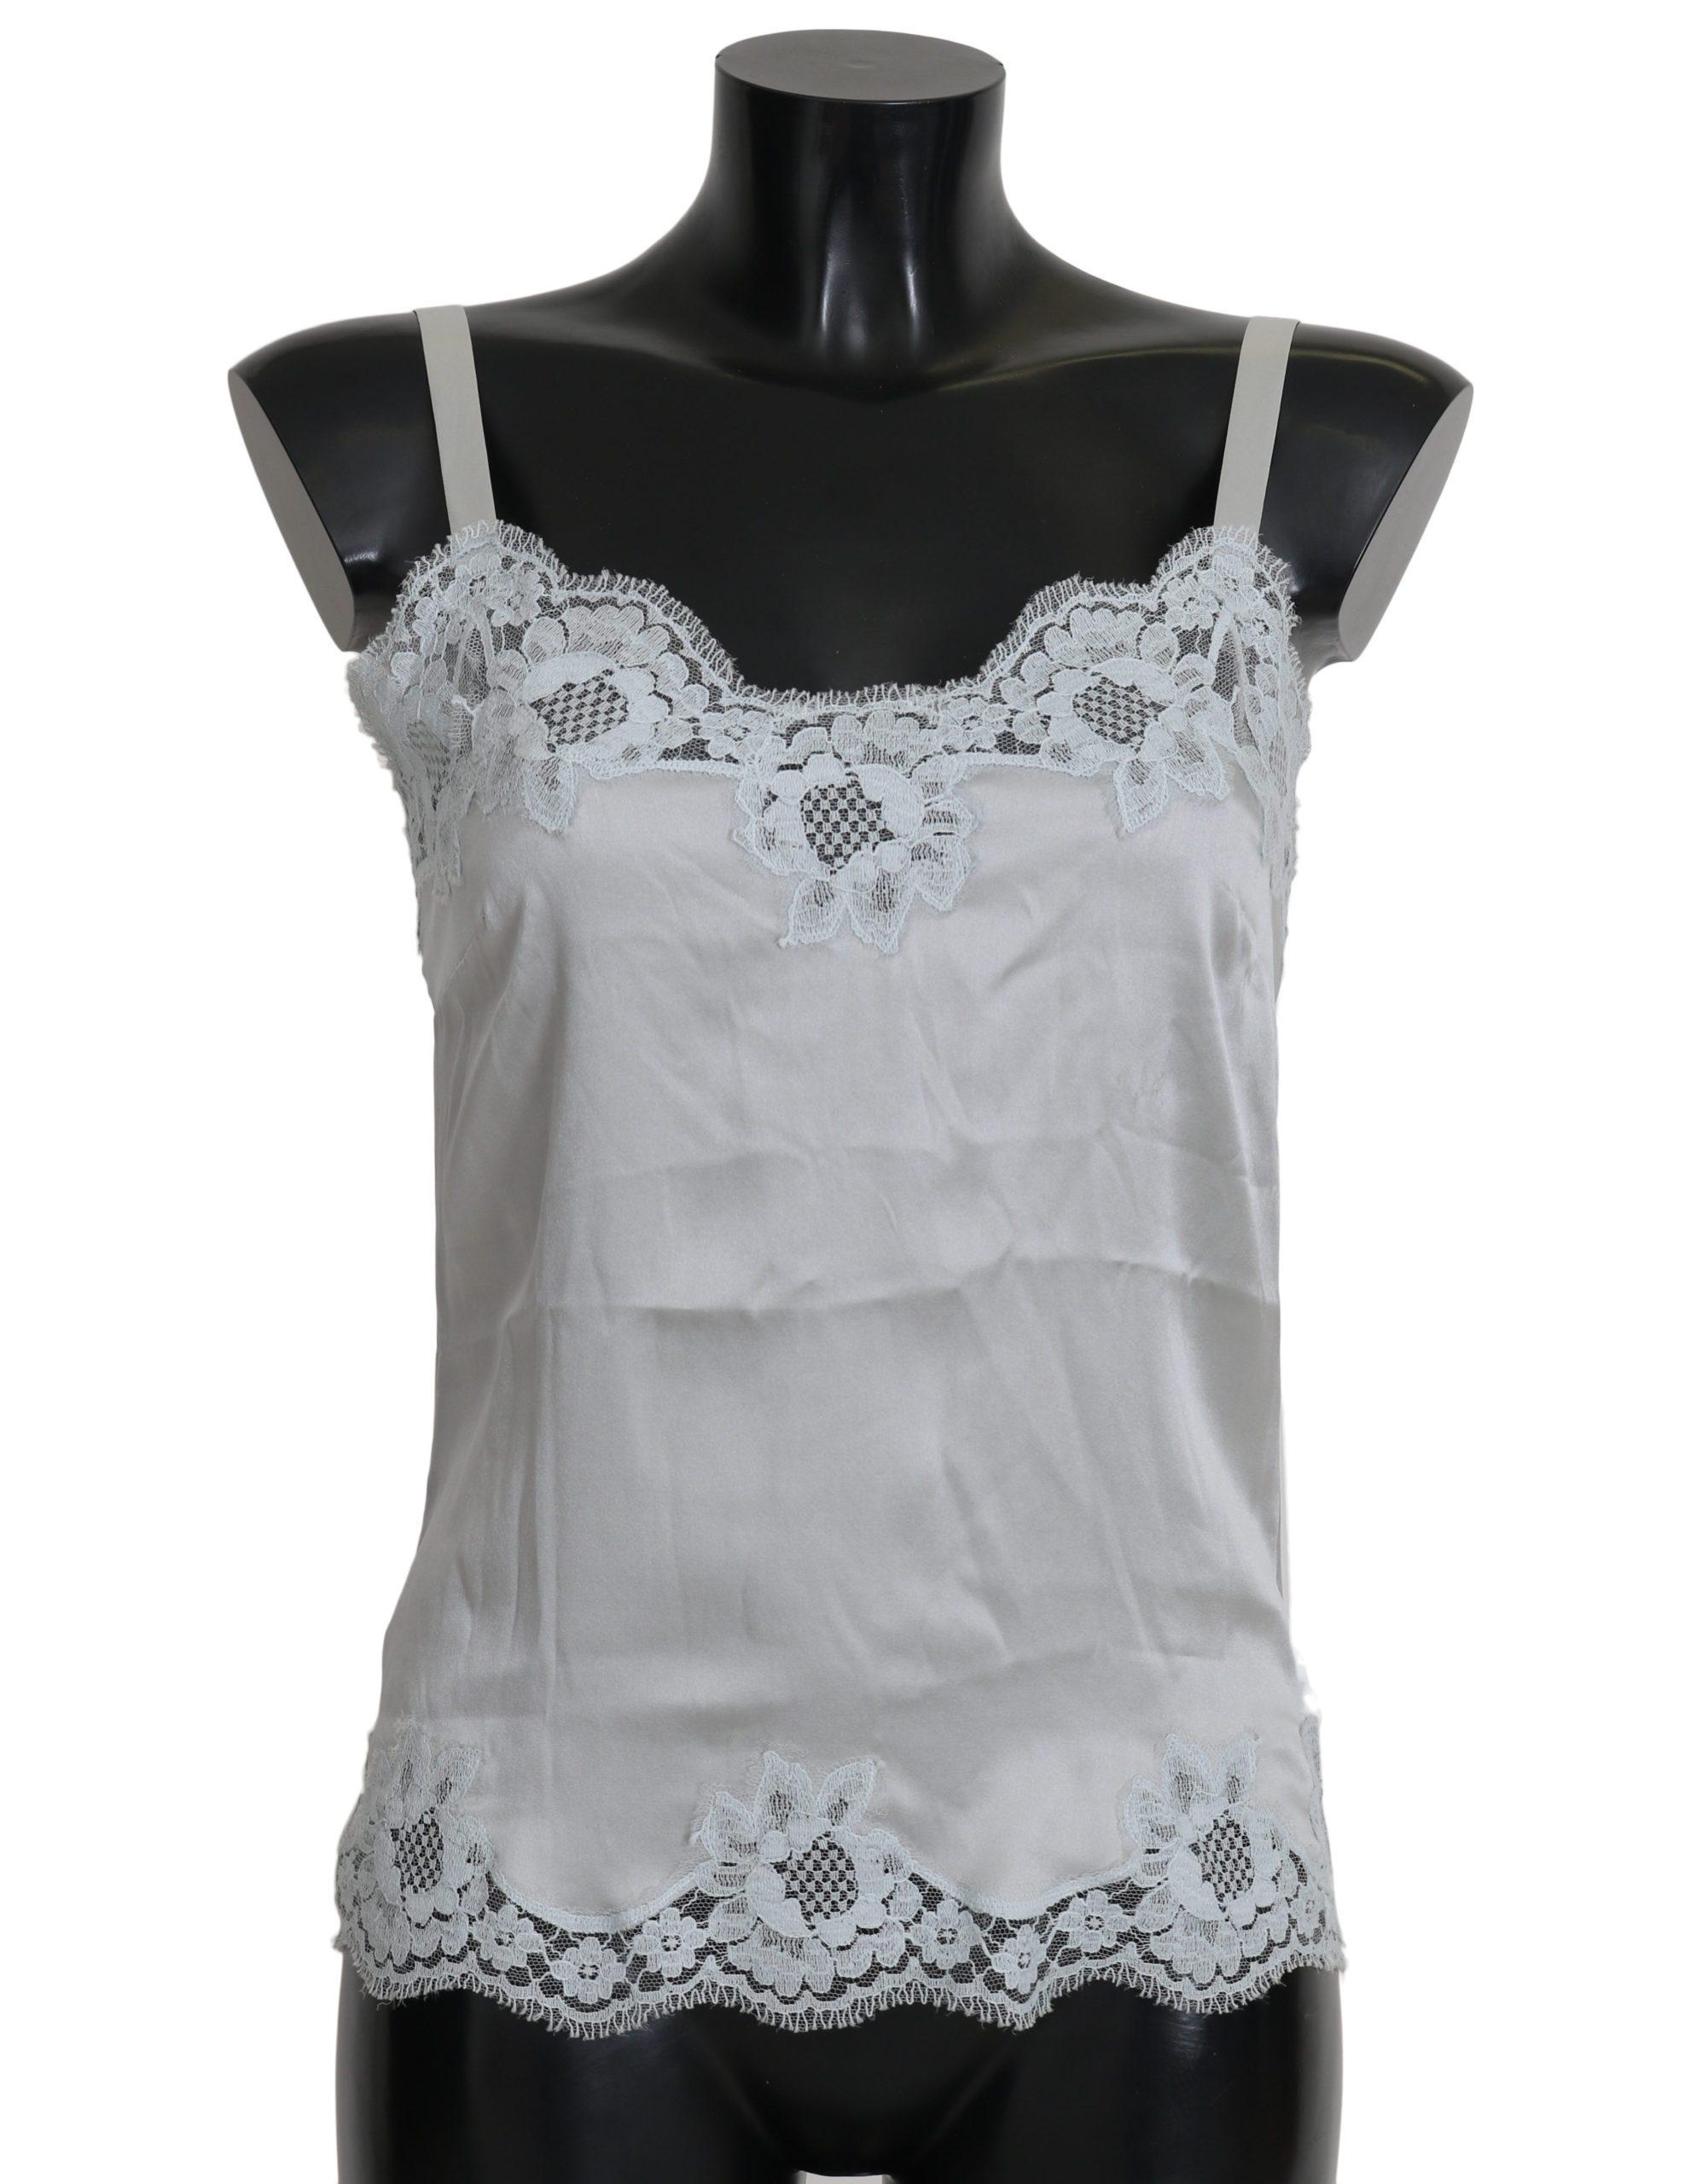 Dolce & Gabbana Women's Silk Lace Dress Lingerie White BIK246 - IT   XS